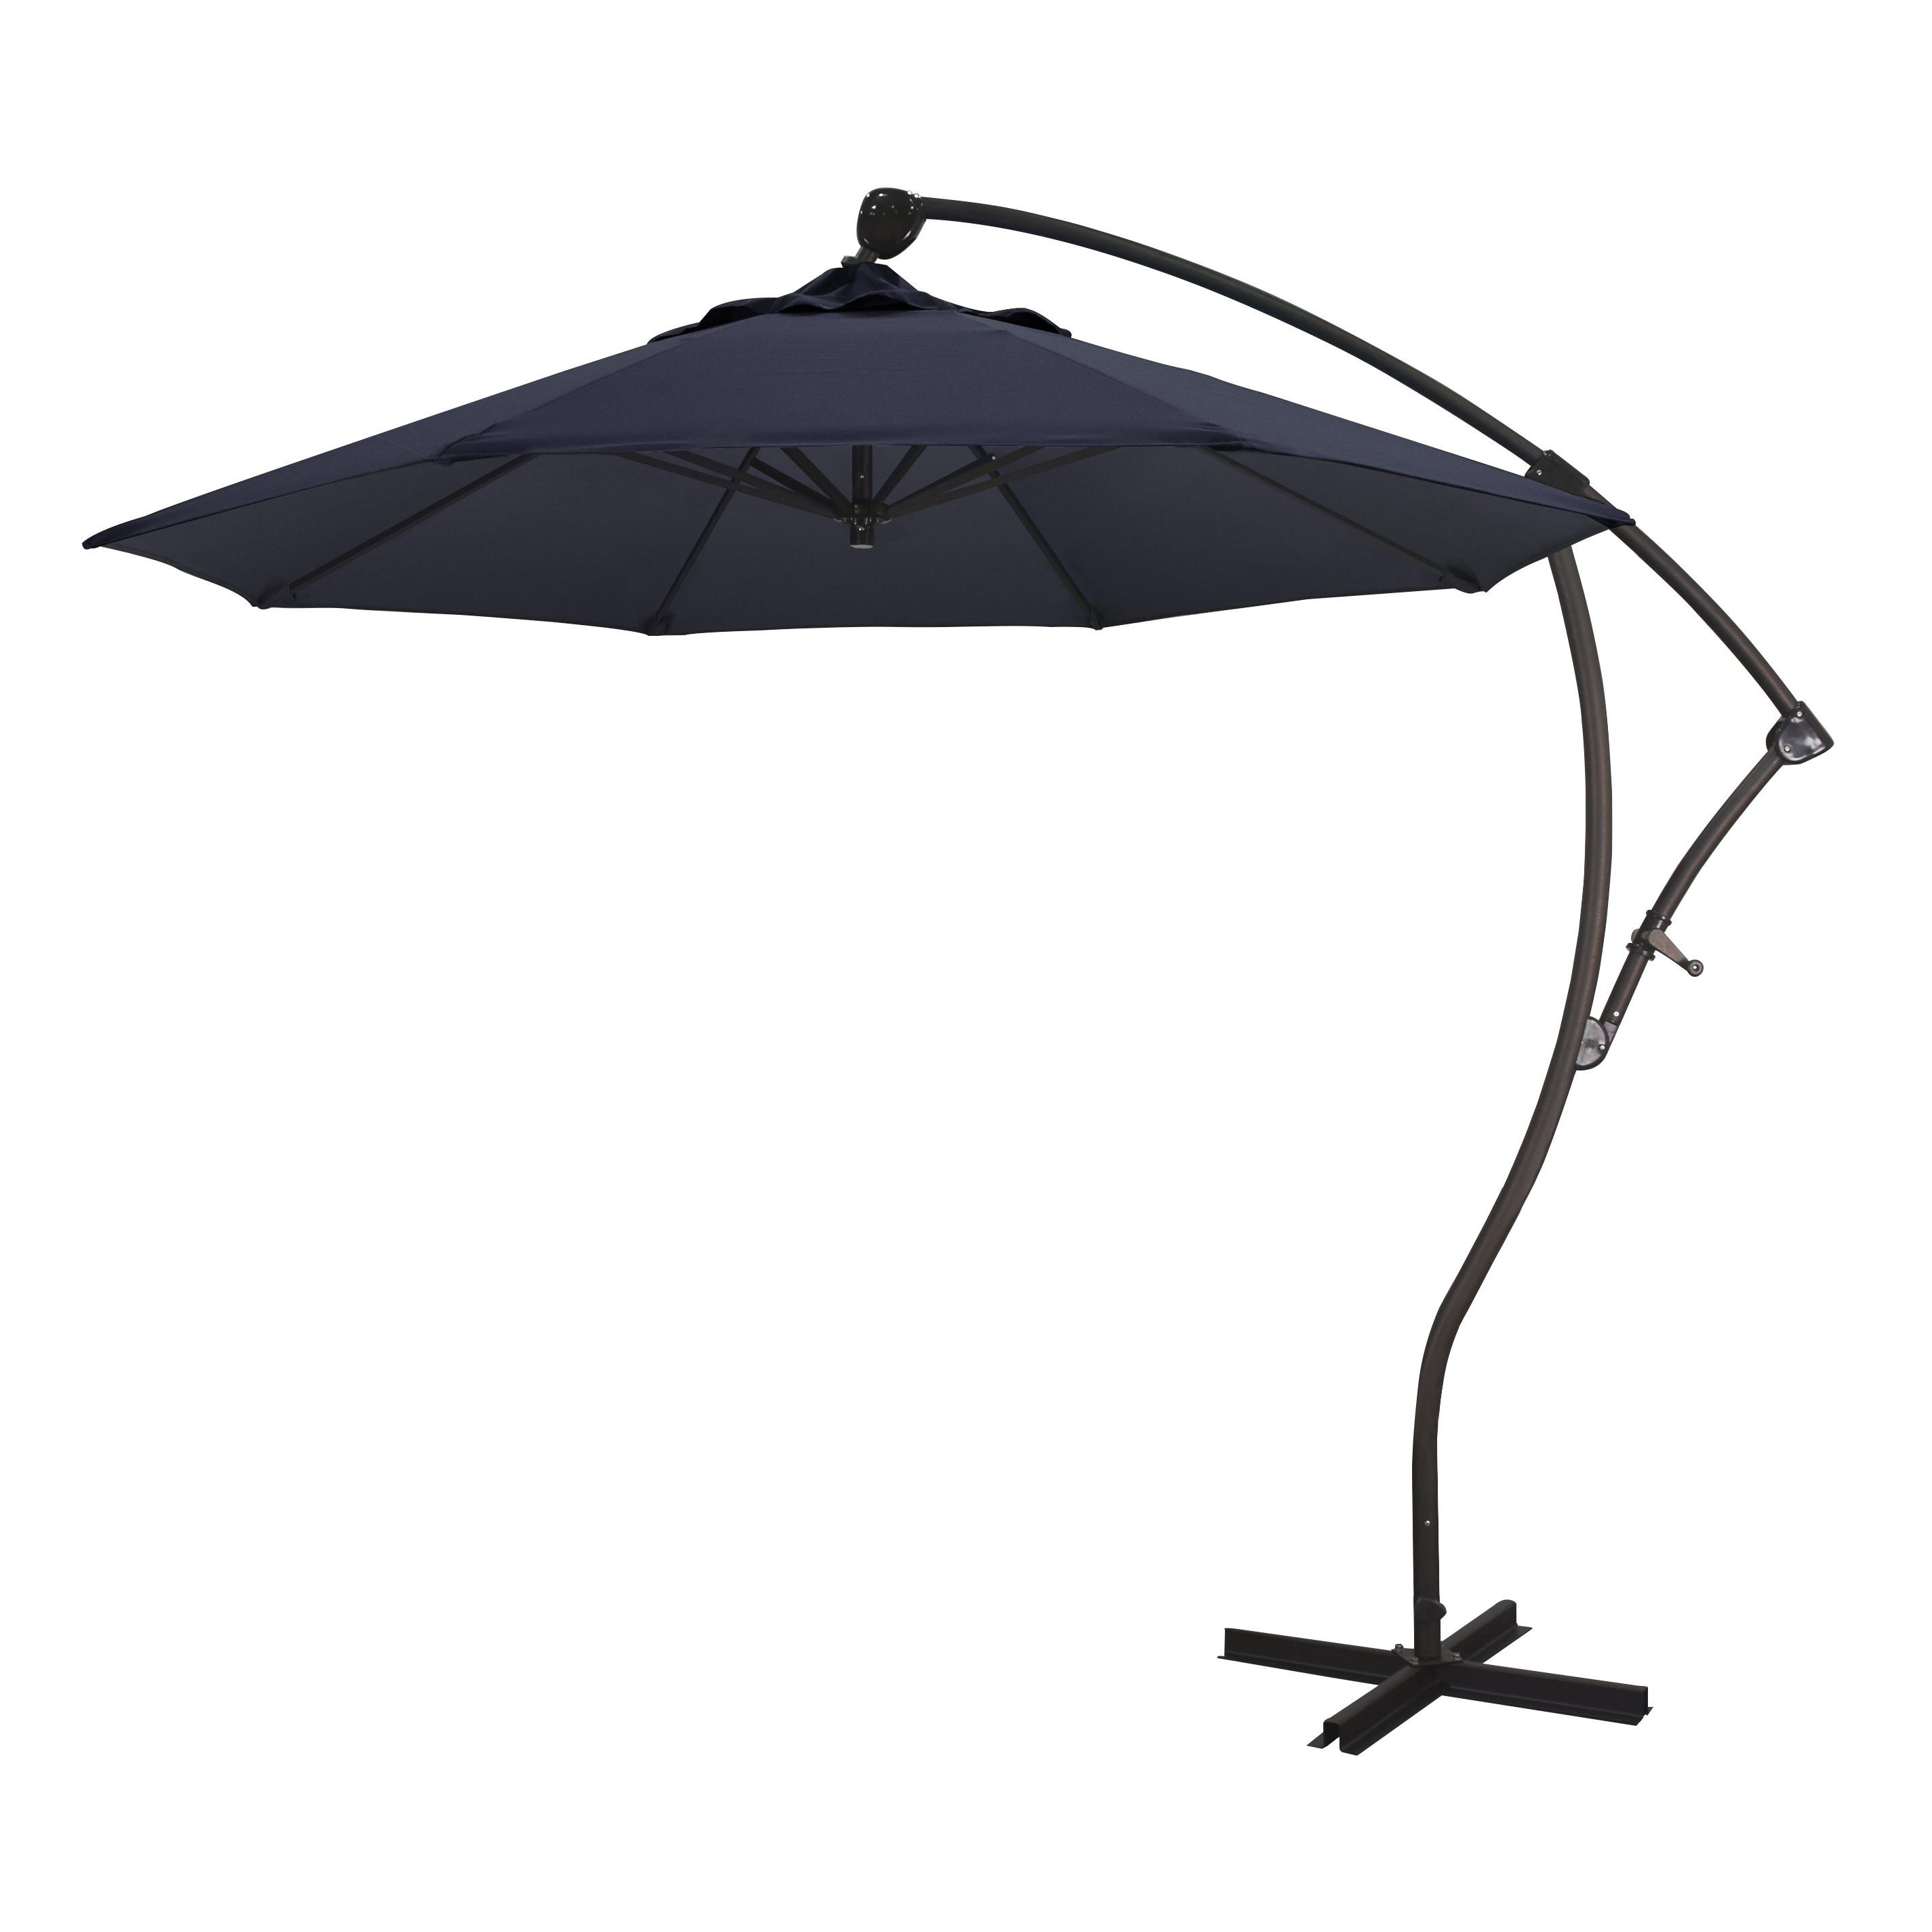 Current Capri 9' Cantilever Umbrella With Regard To Freda Cantilever Umbrellas (View 5 of 20)